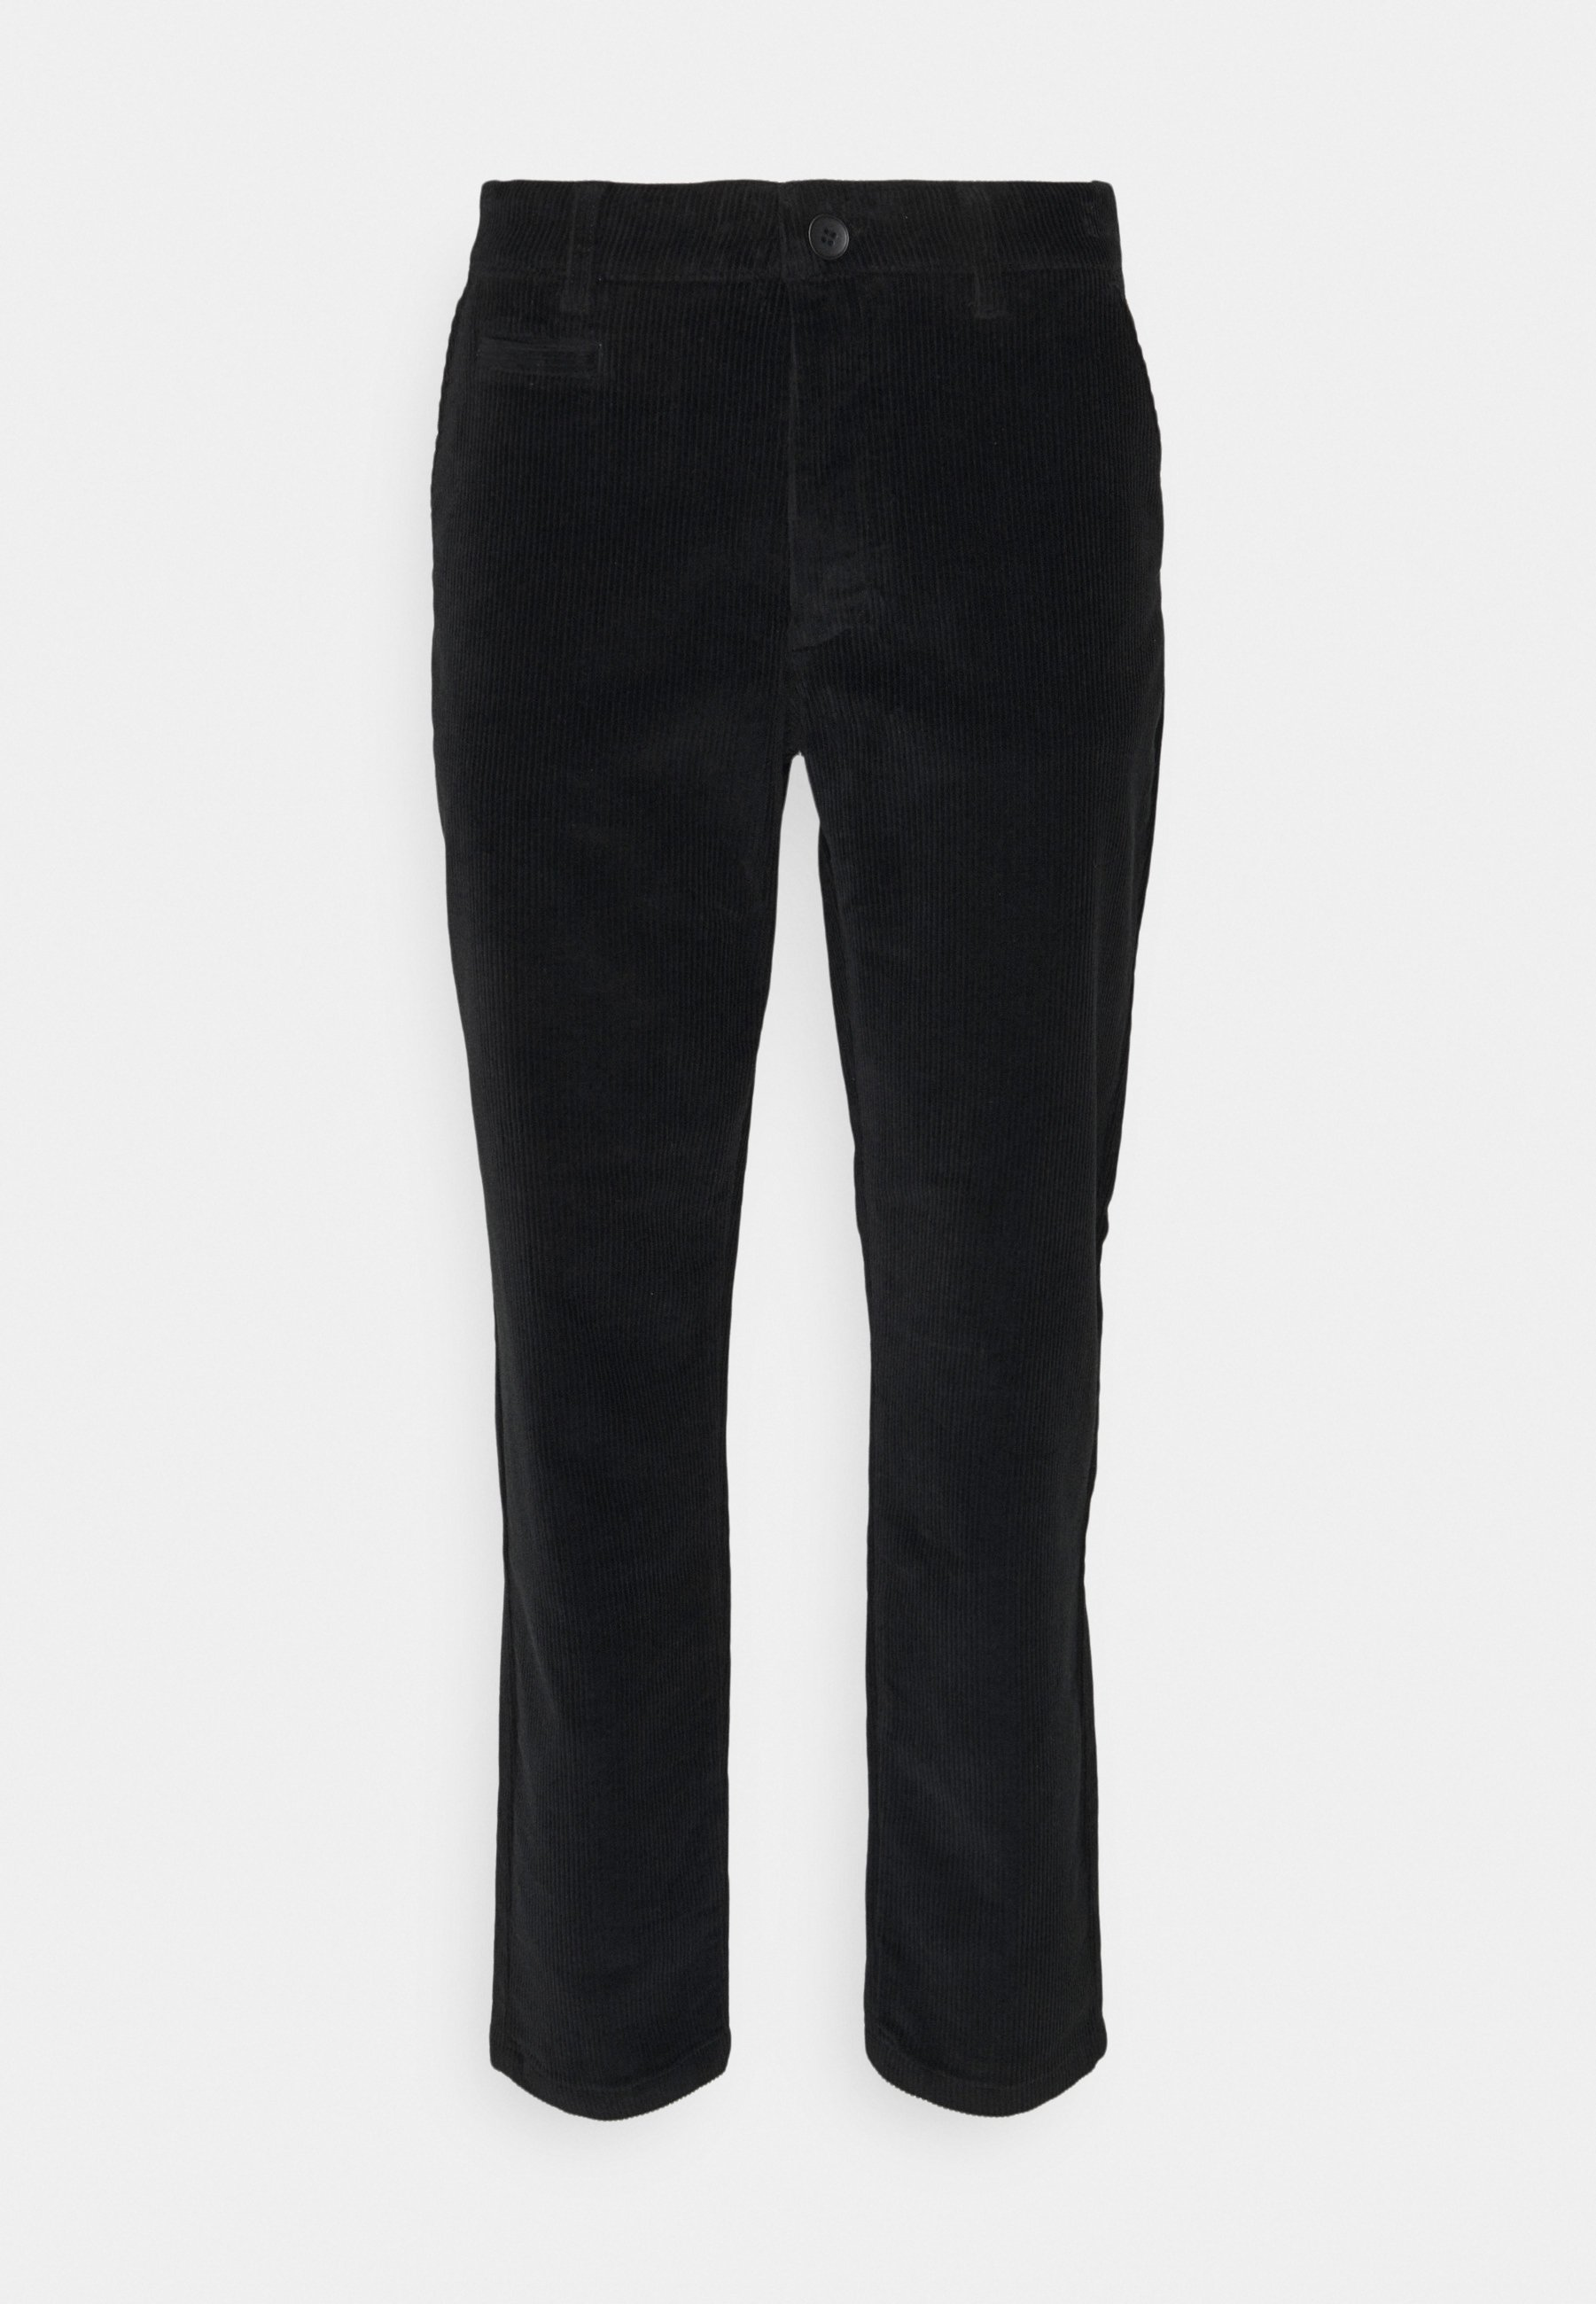 Uomo CHUCK REGULAR STRETCHED PANT - Pantaloni